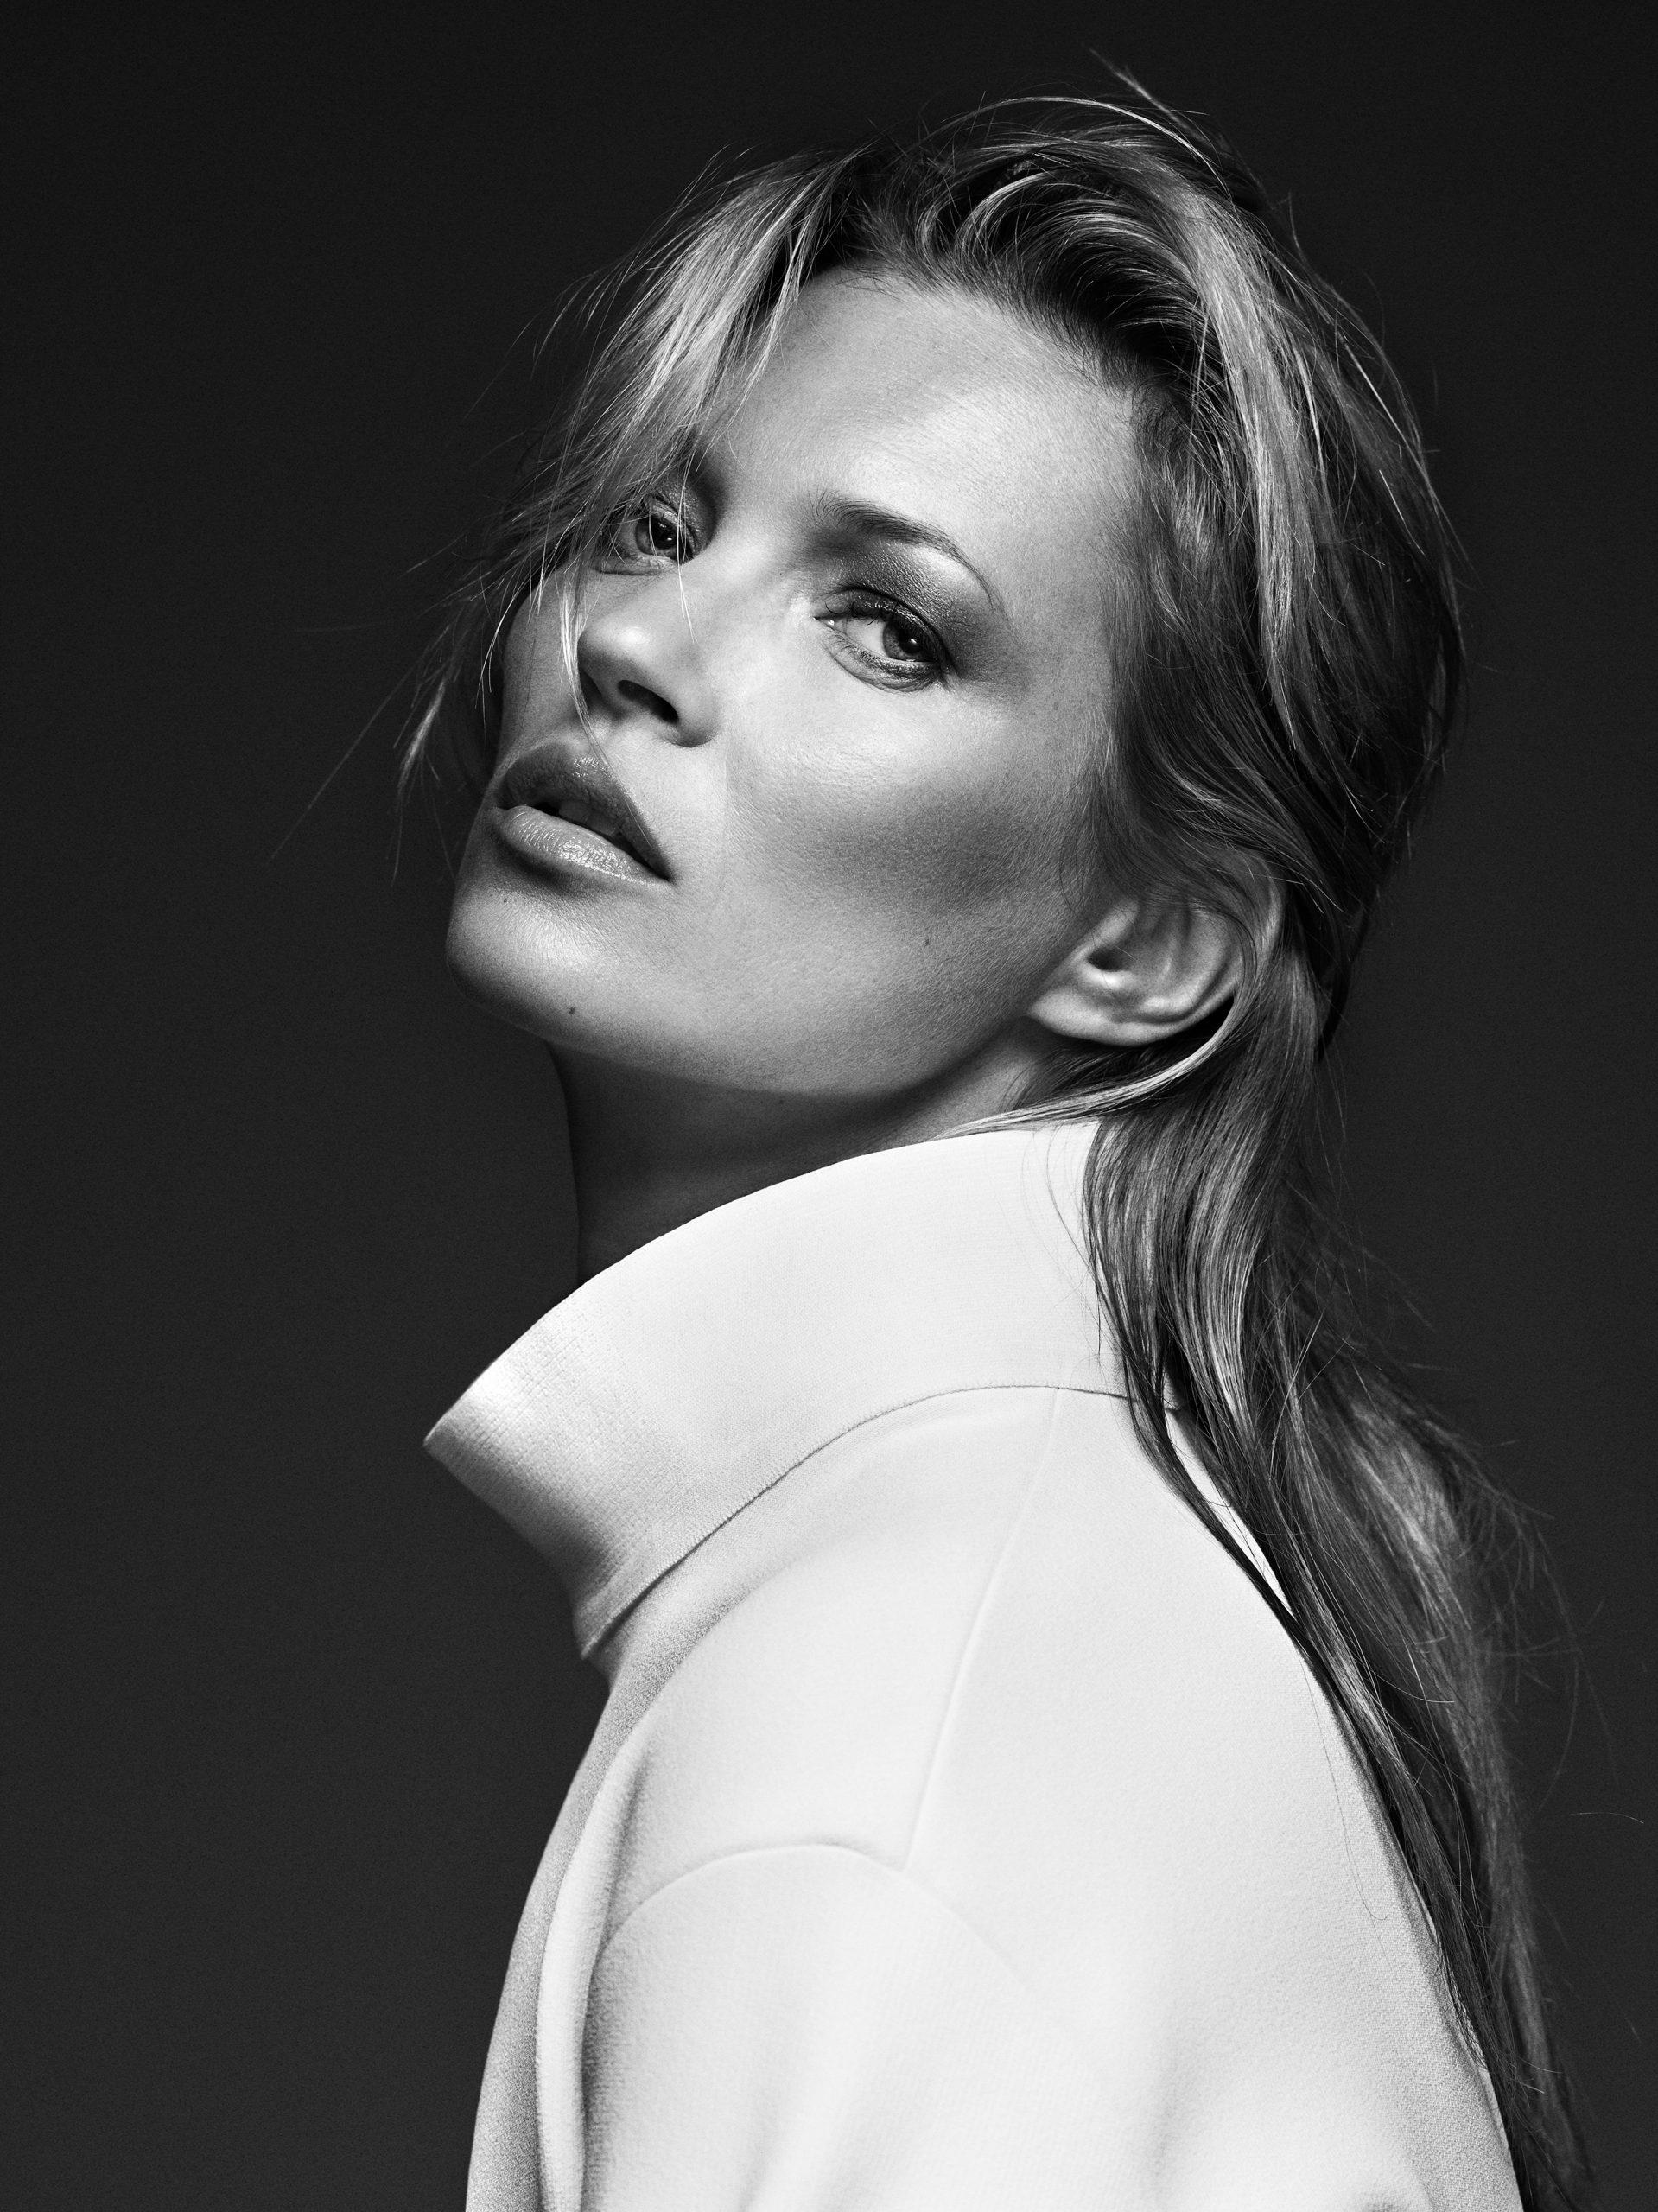 Kate Moss, White Coat, London 2013 © Bryan Adams